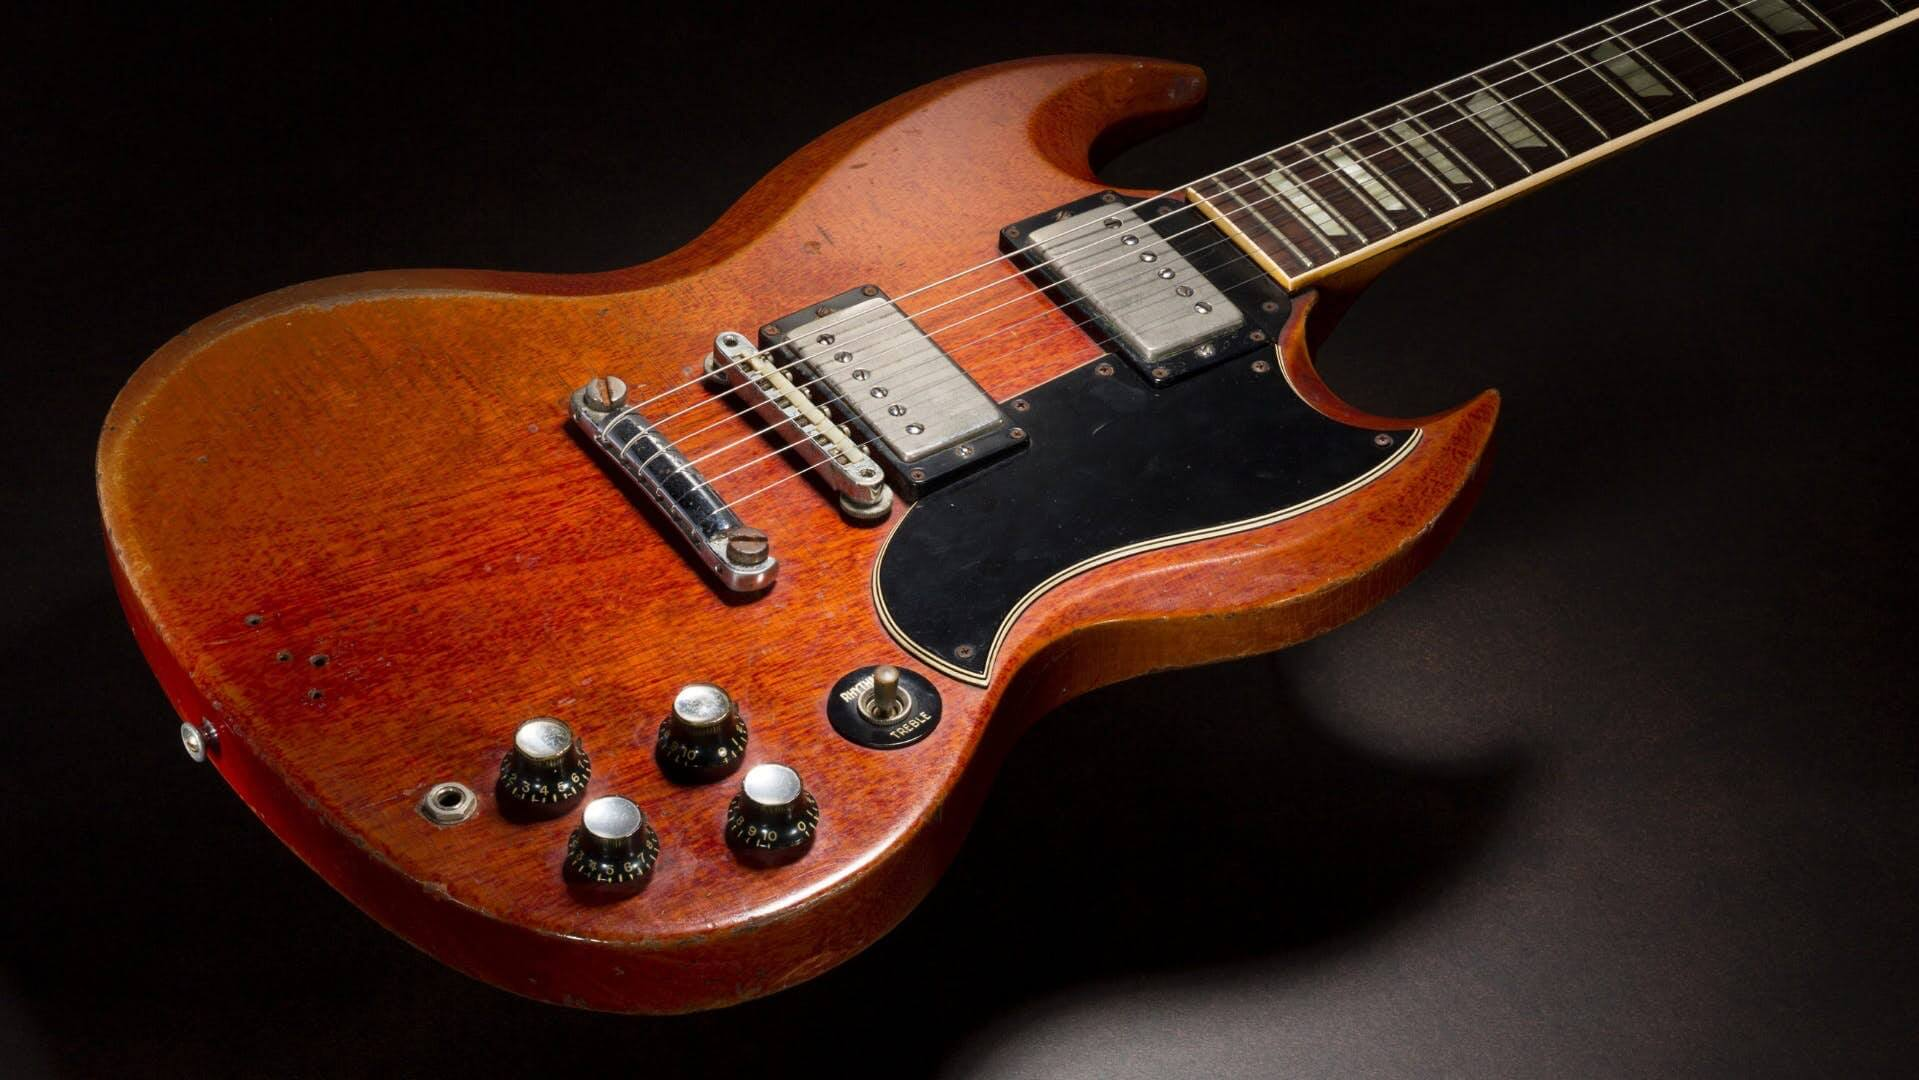 Duane Allman's Gibson SG fetches $591,000 at auction